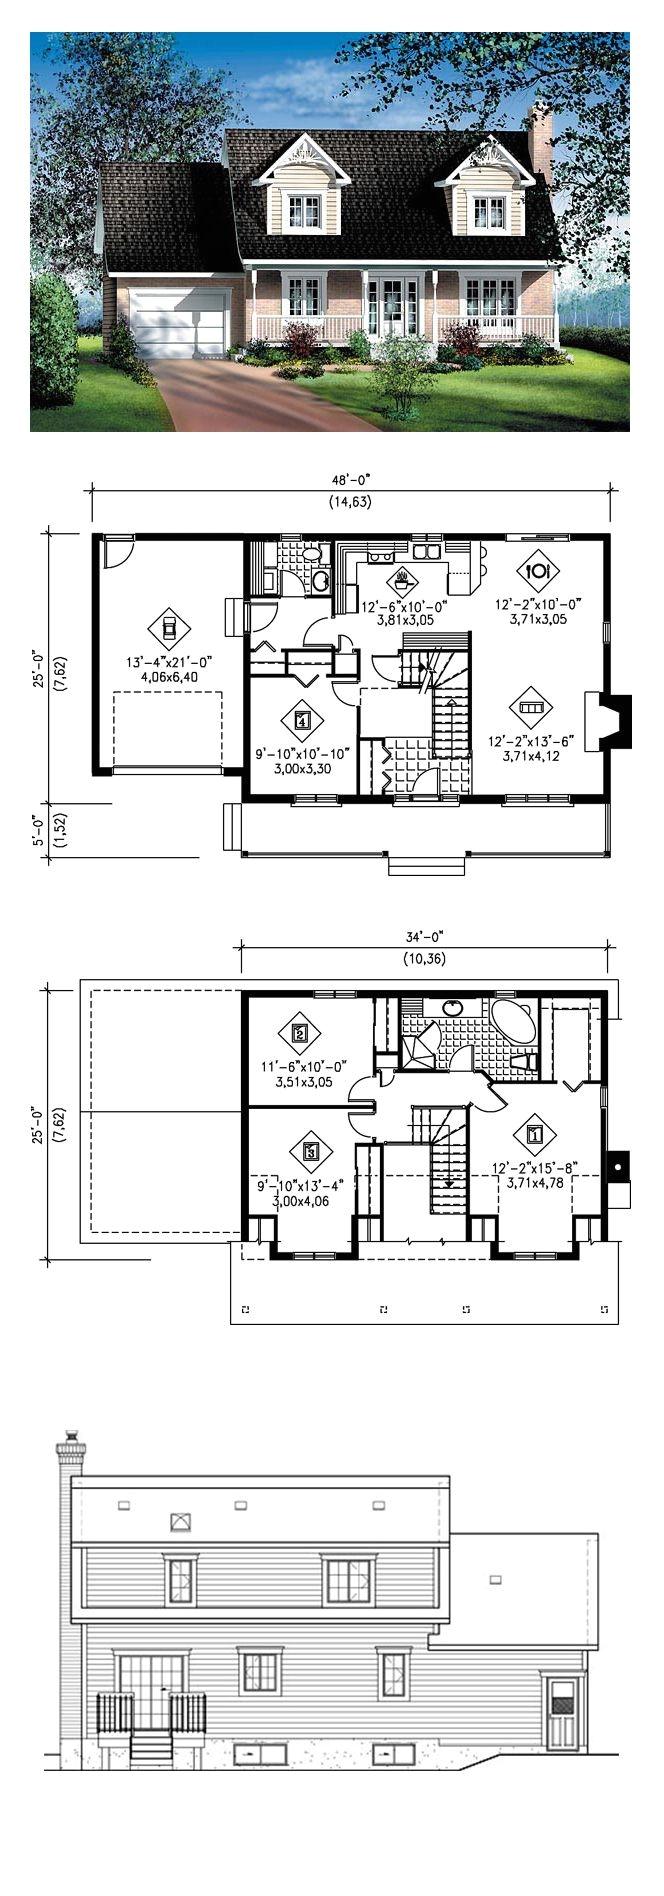 House Plans that Can Be Built for Under 150k 150k House Plans Elegant Gorgeous 20 Small Cape Cod House Plans